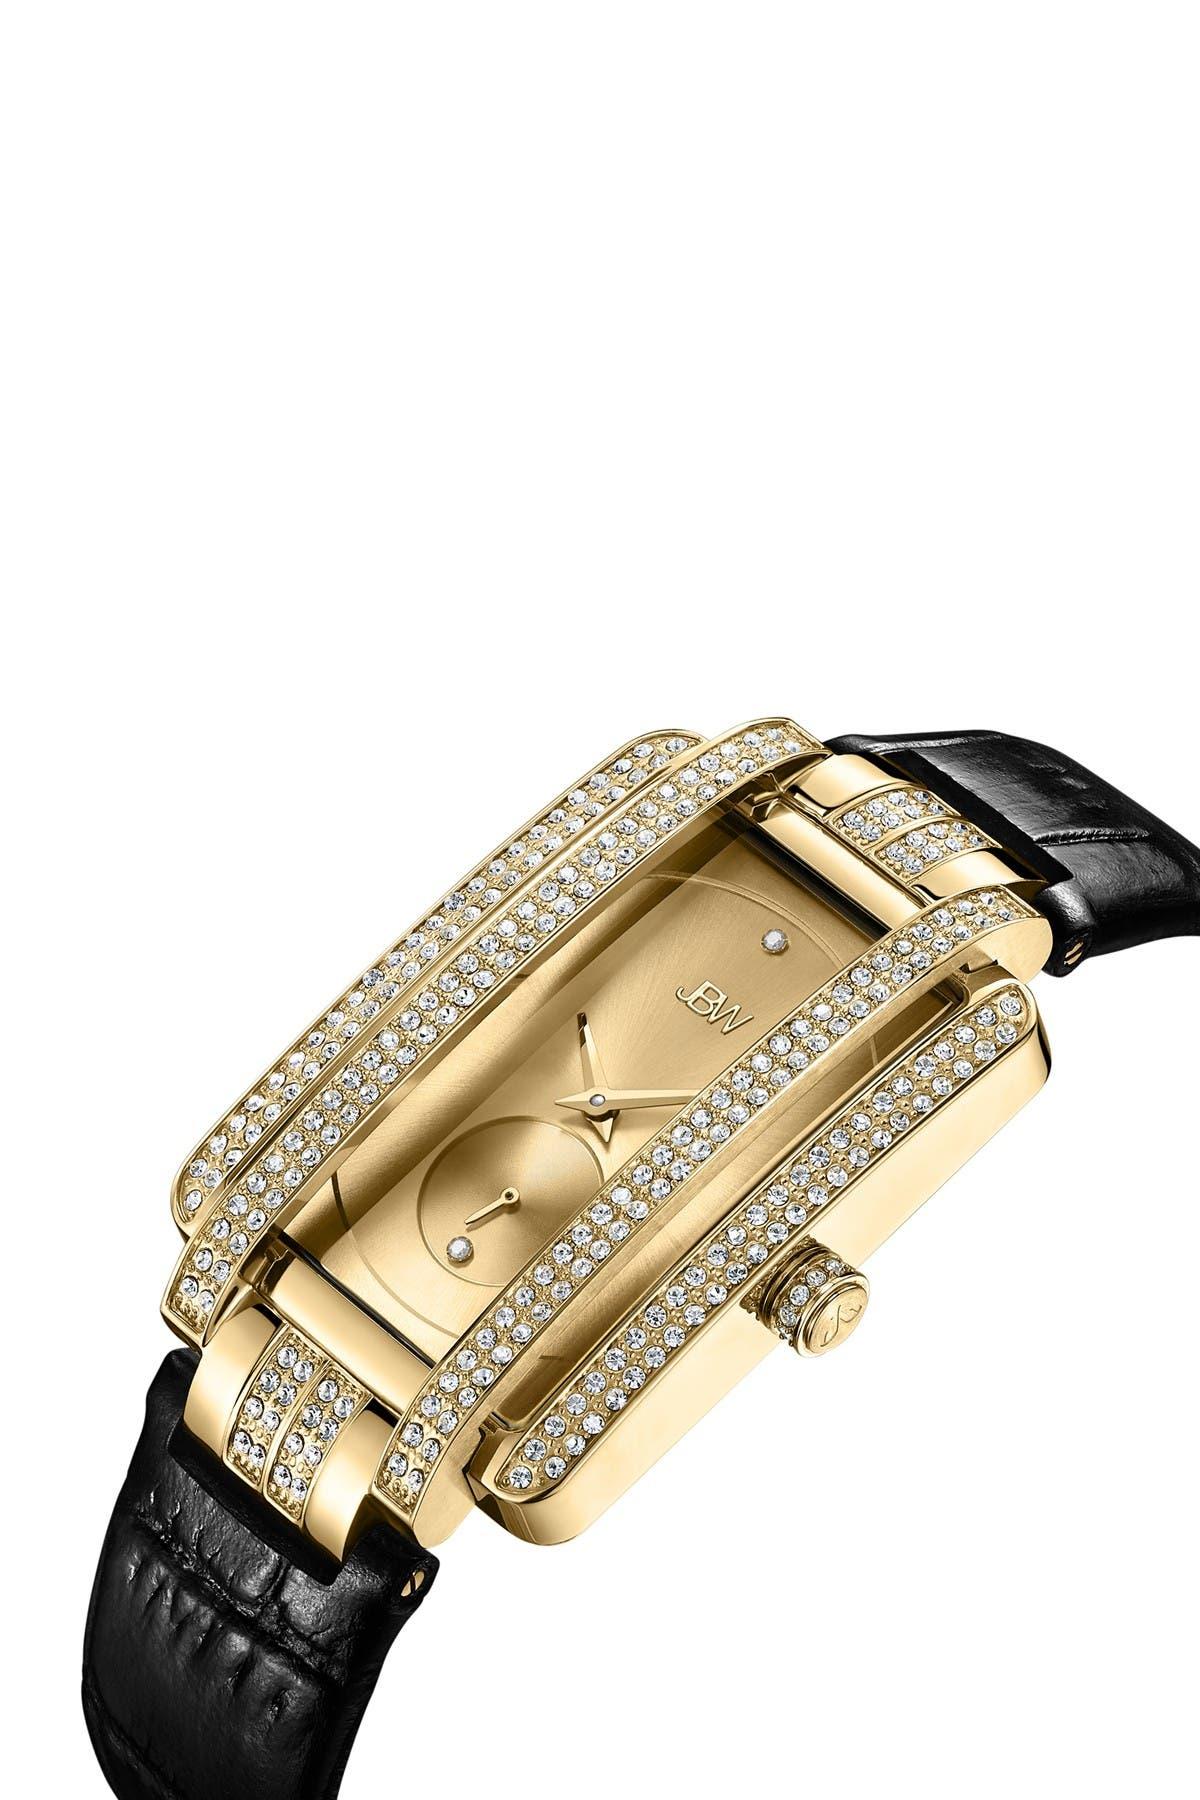 Image of JBW Women's Mink Diamond Croc Embossed Leather Strap Watch, 28mm - 0.02 ctw